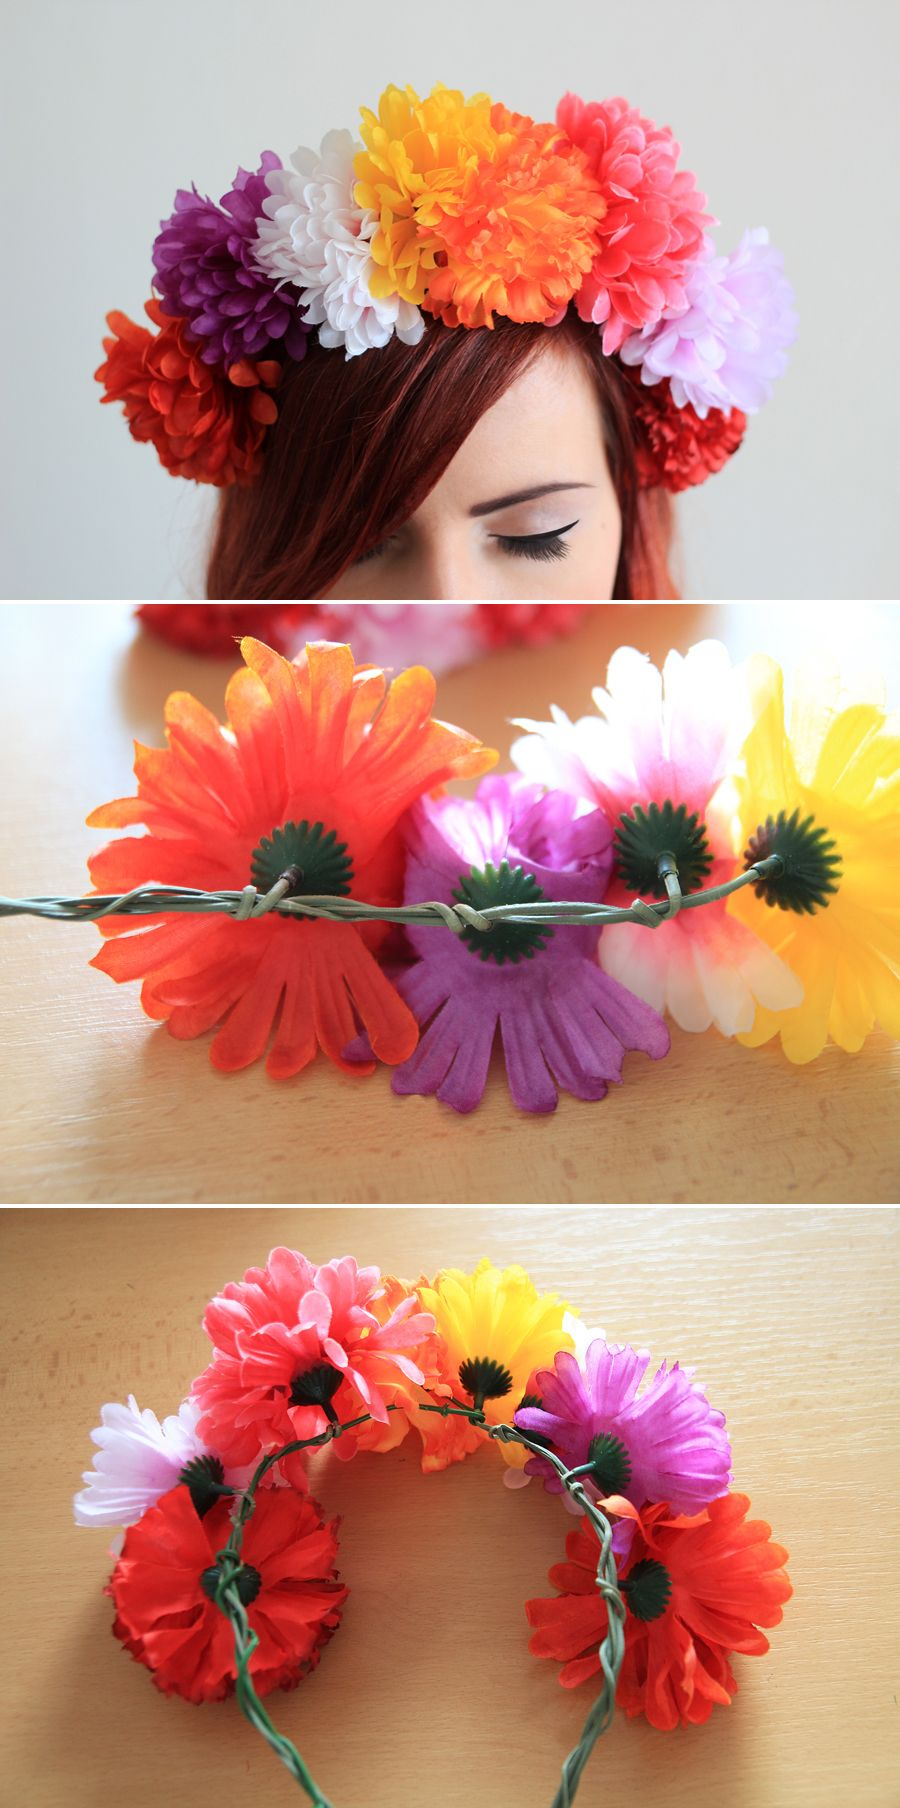 Diy headband fake flower crown my diy in 2018 pinterest diy headband fake flower crown izmirmasajfo